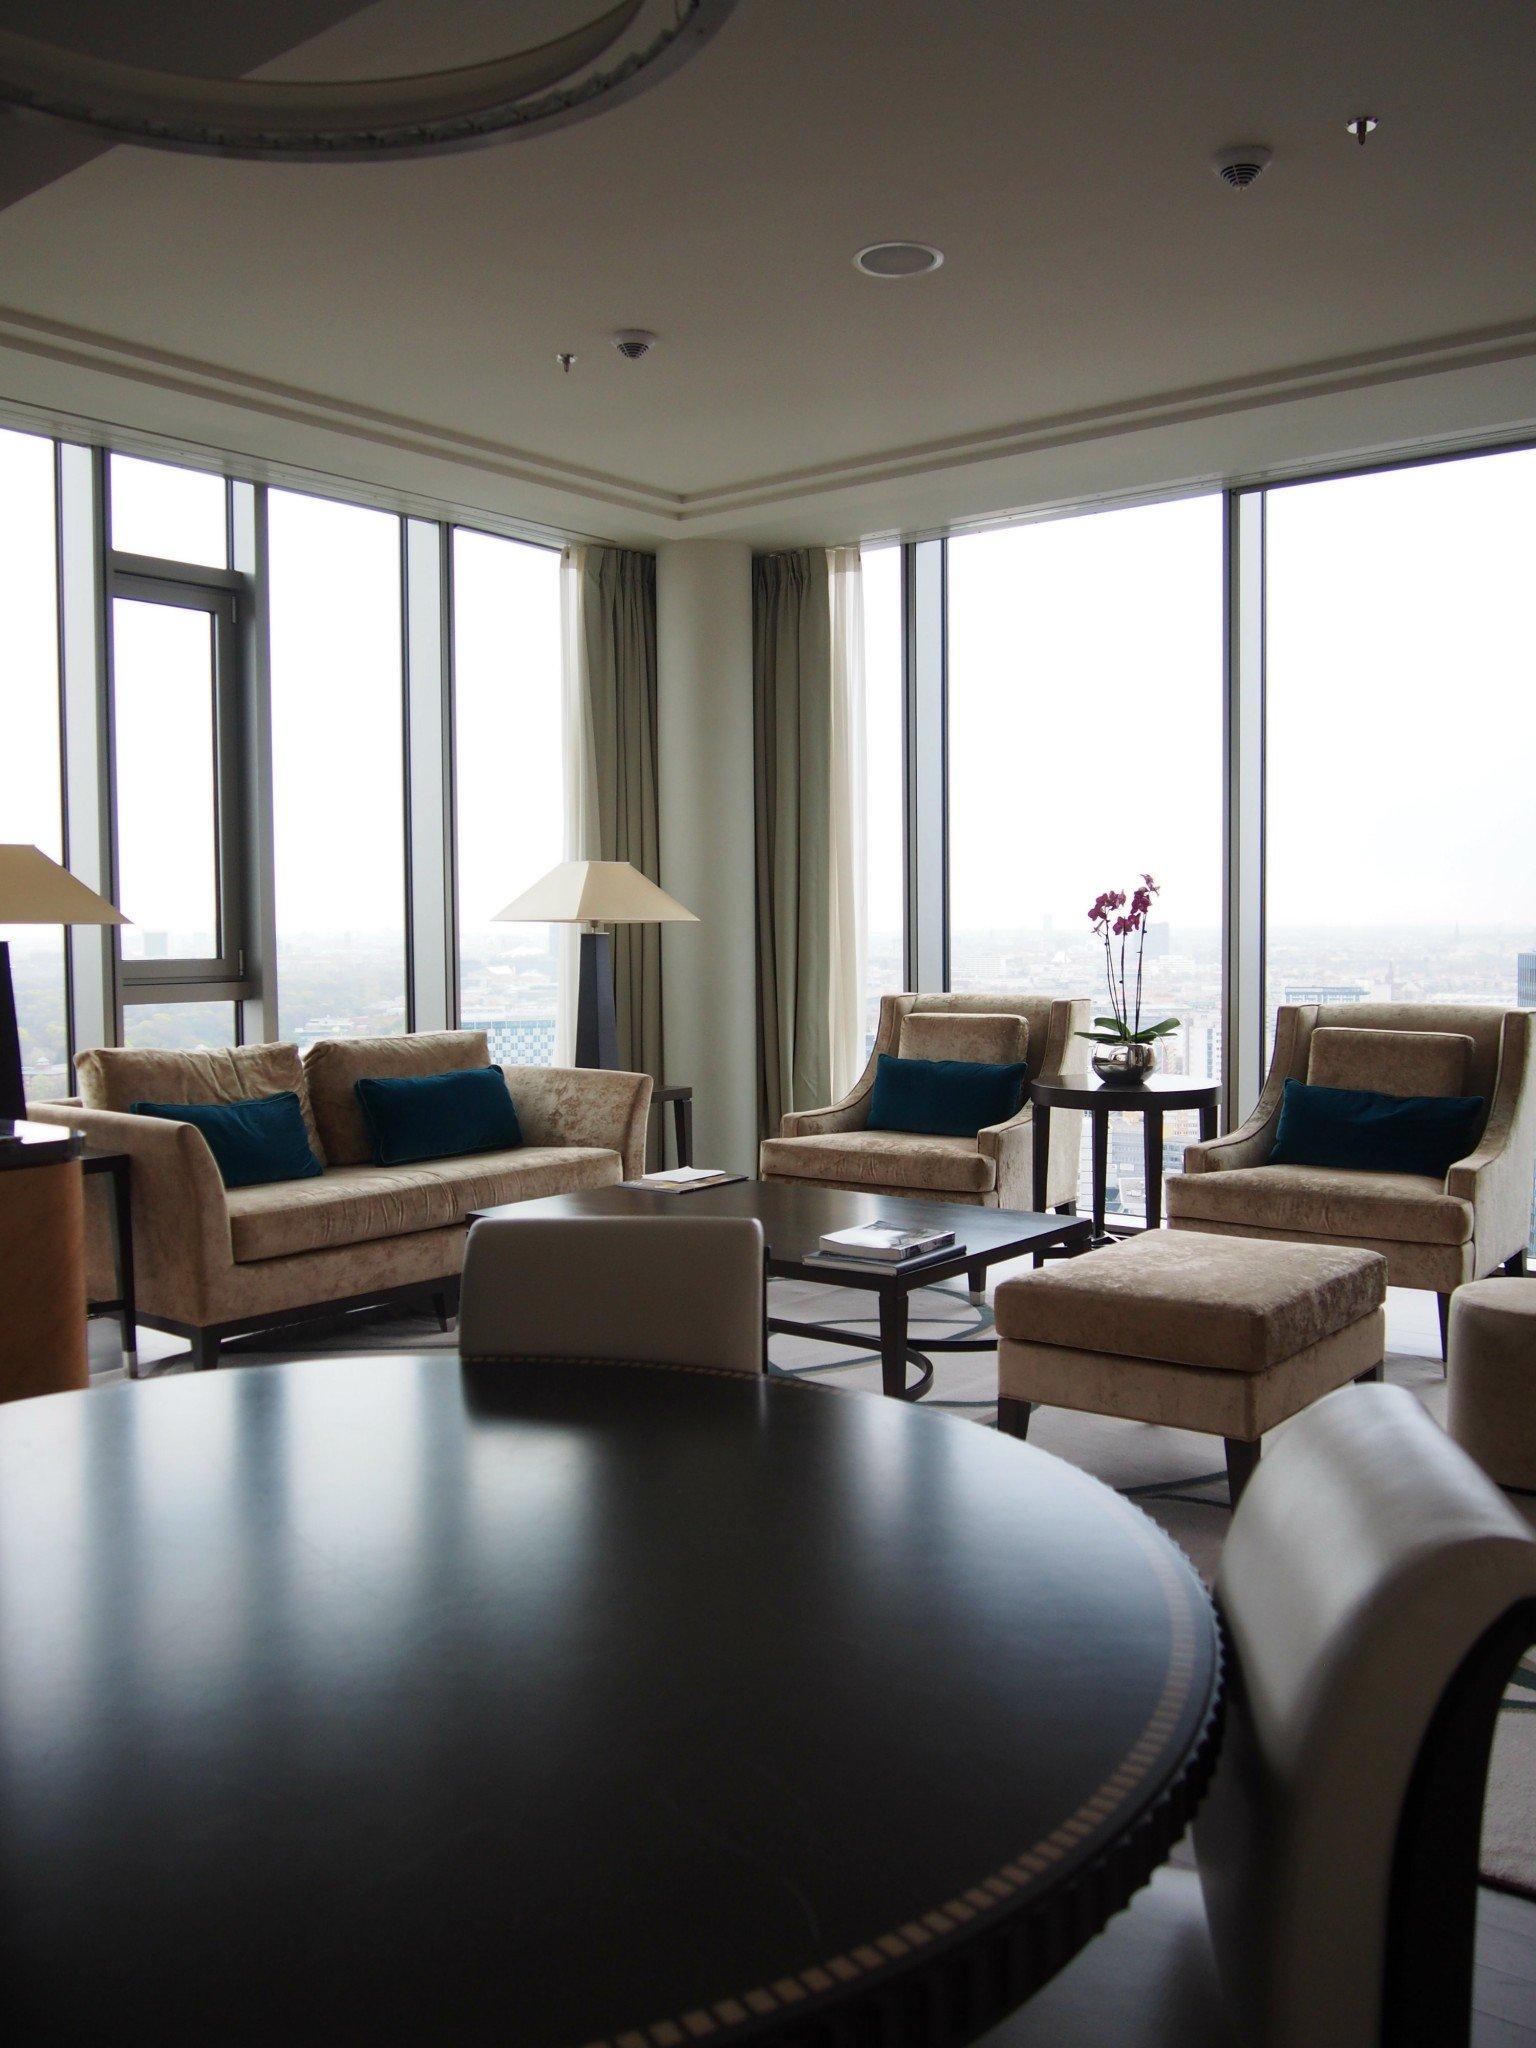 Waldorf Astoria Berlin Tower Suite olohuone 1